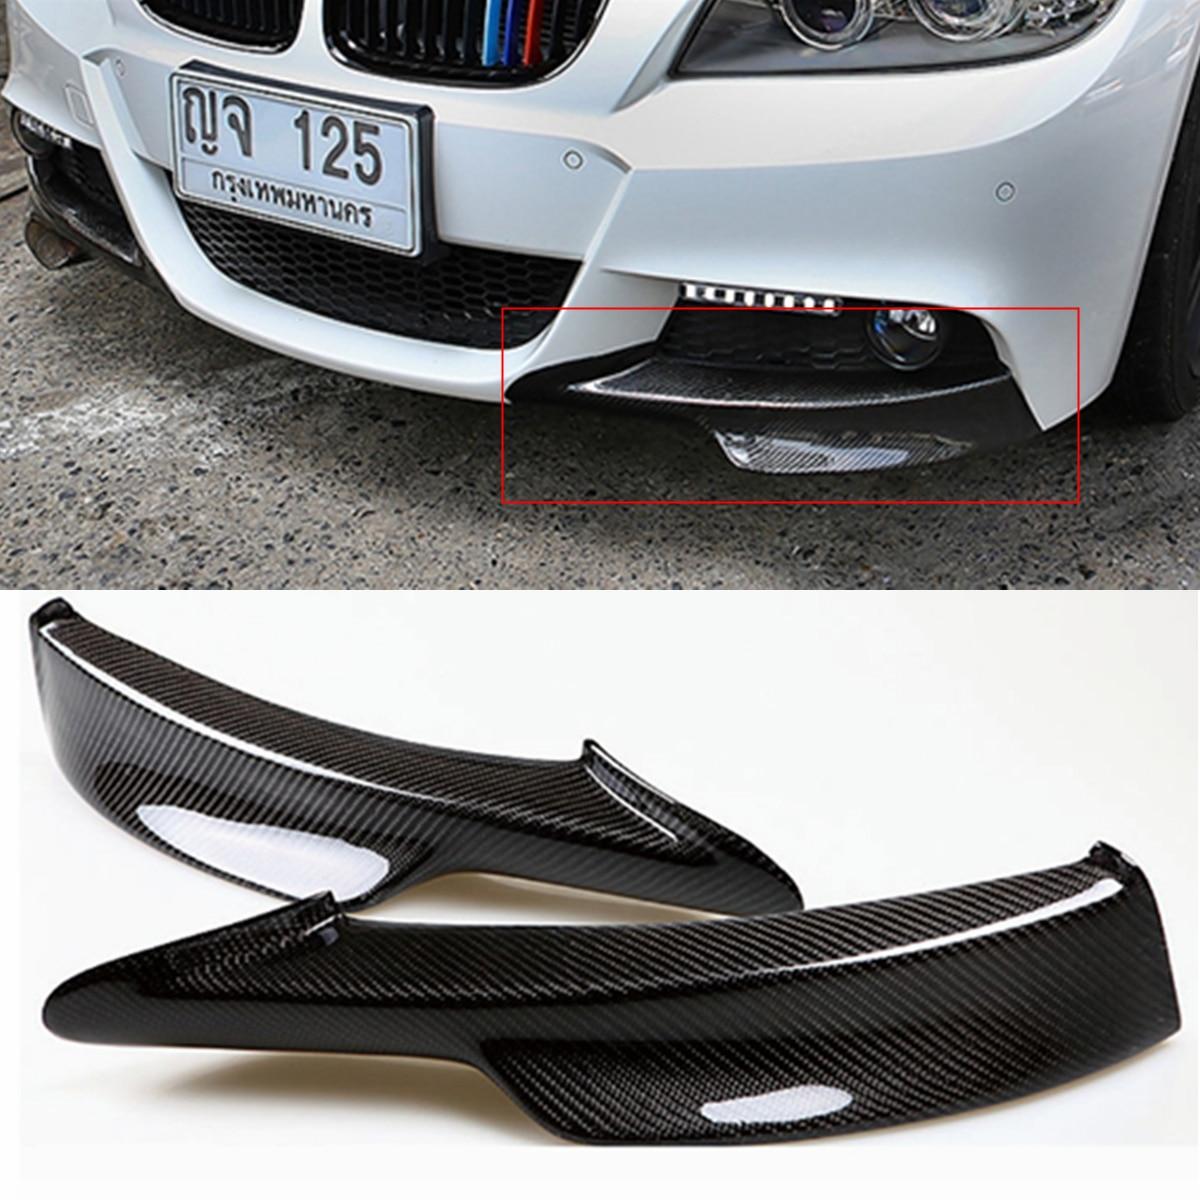 Universal Car Front Bumper Lip Fit For For BMW E90 335i LCI M Tech Real Carbon Fiber Front Bumper Protector Upper Side Splitter